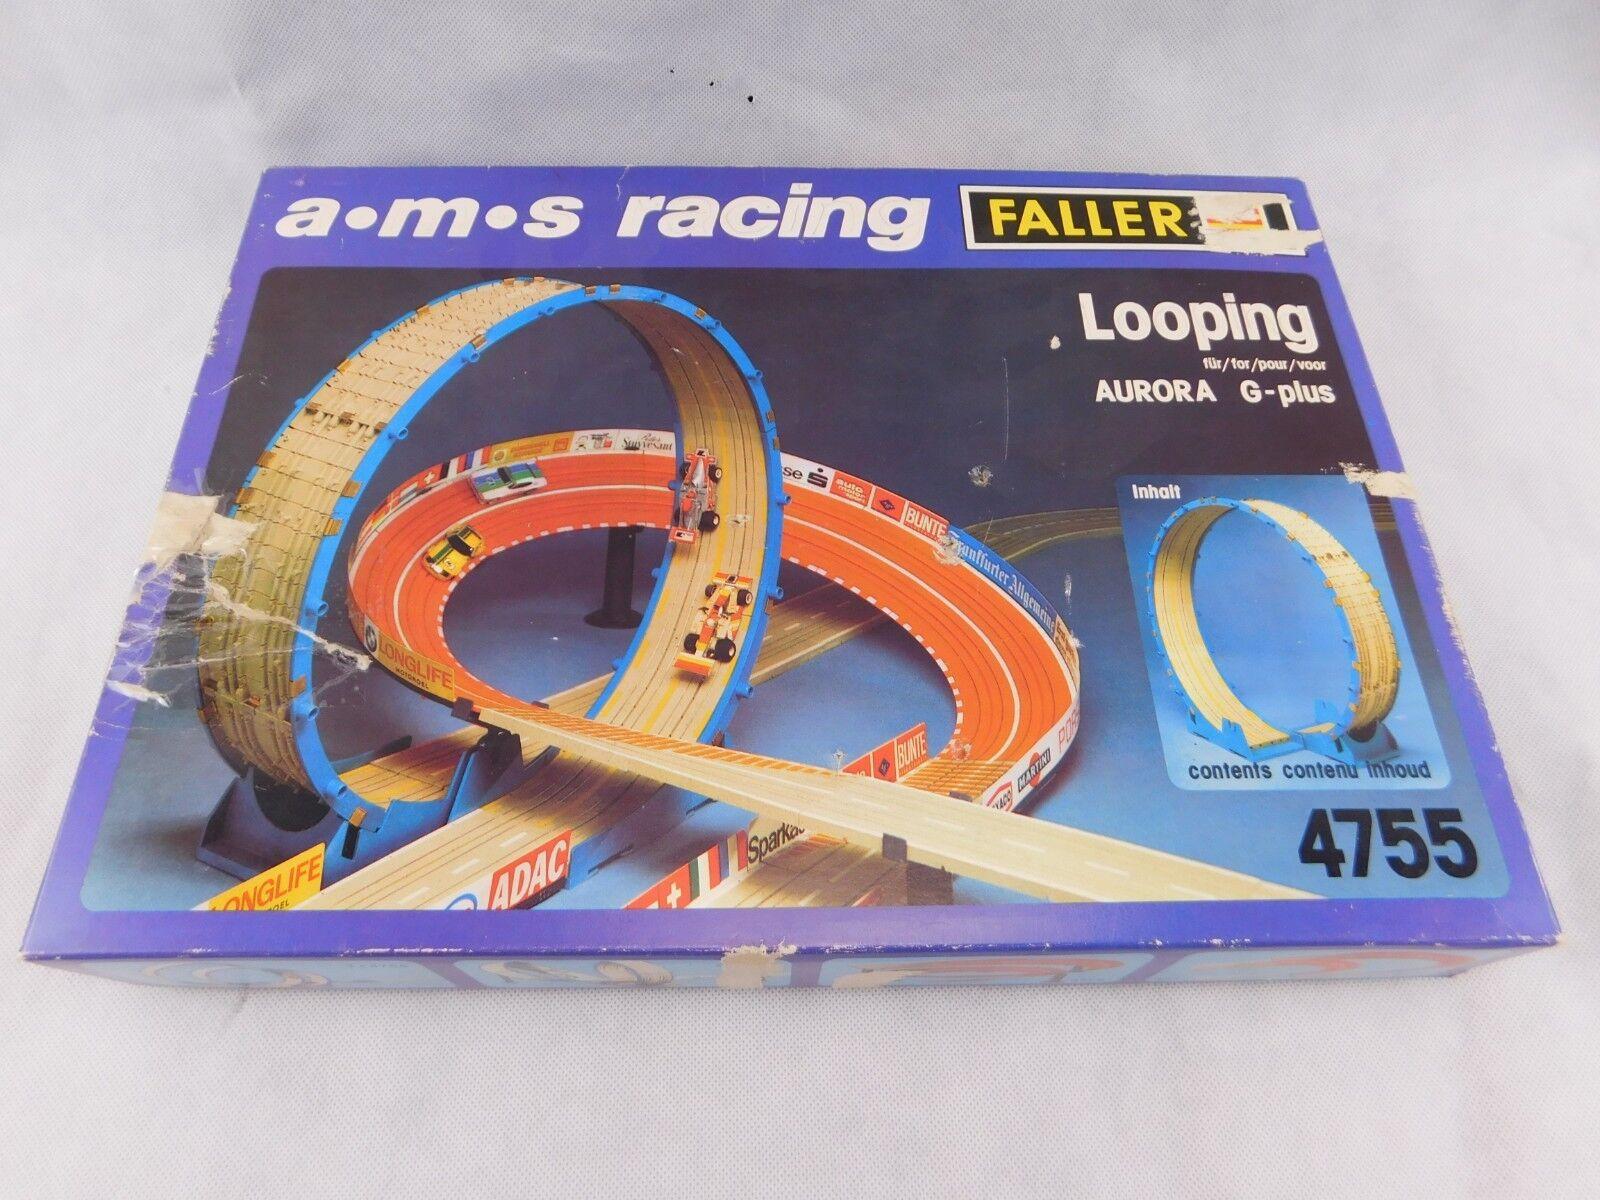 FALLER Looping 4755 ams Auto Motor Sport Racing für Aurora G-plus H0 1:87 OVP.